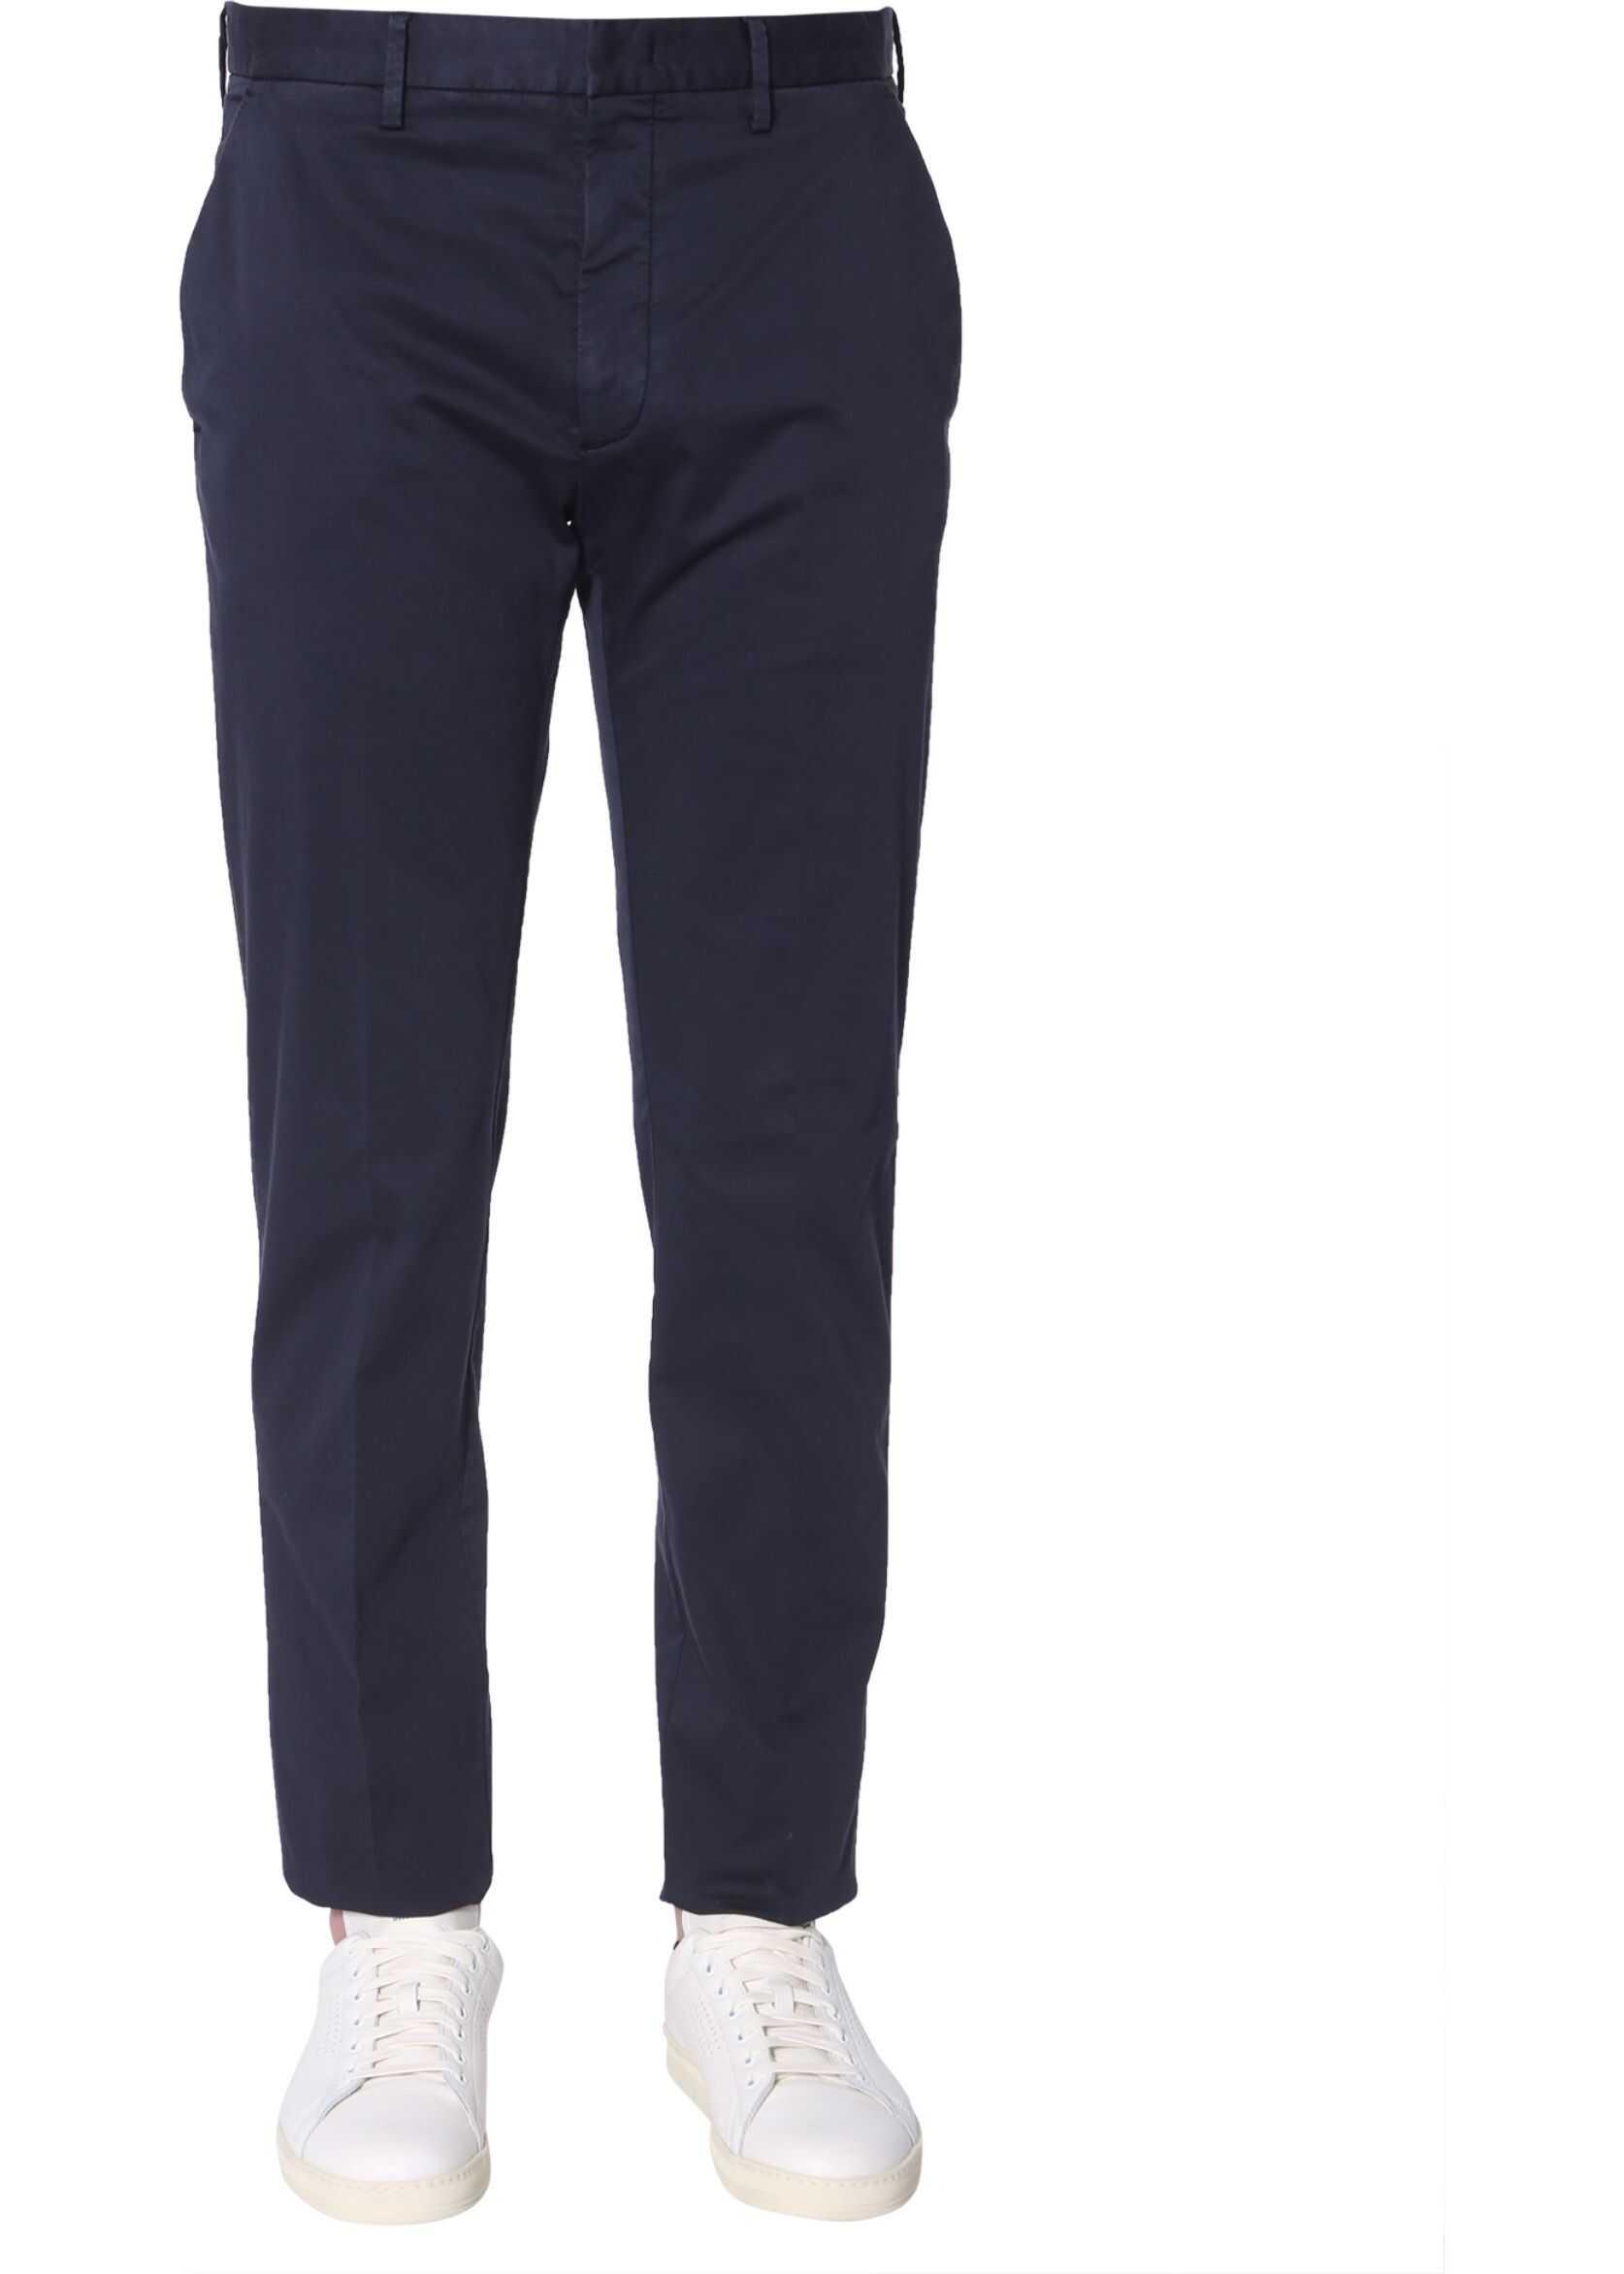 Z Zegna Slim Fit Trousers BLUE